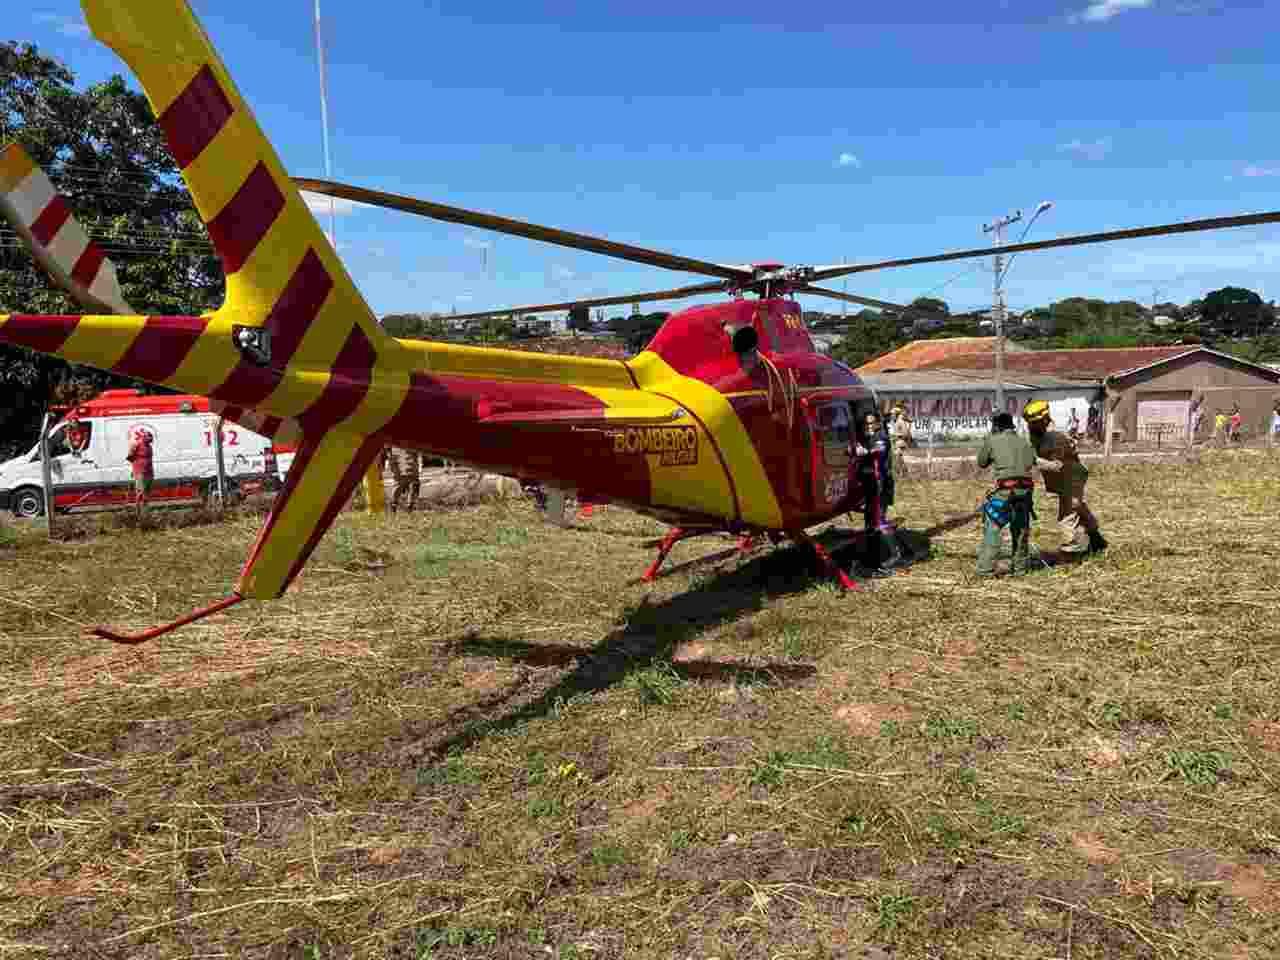 Bombeiros helicóptero Goiânia